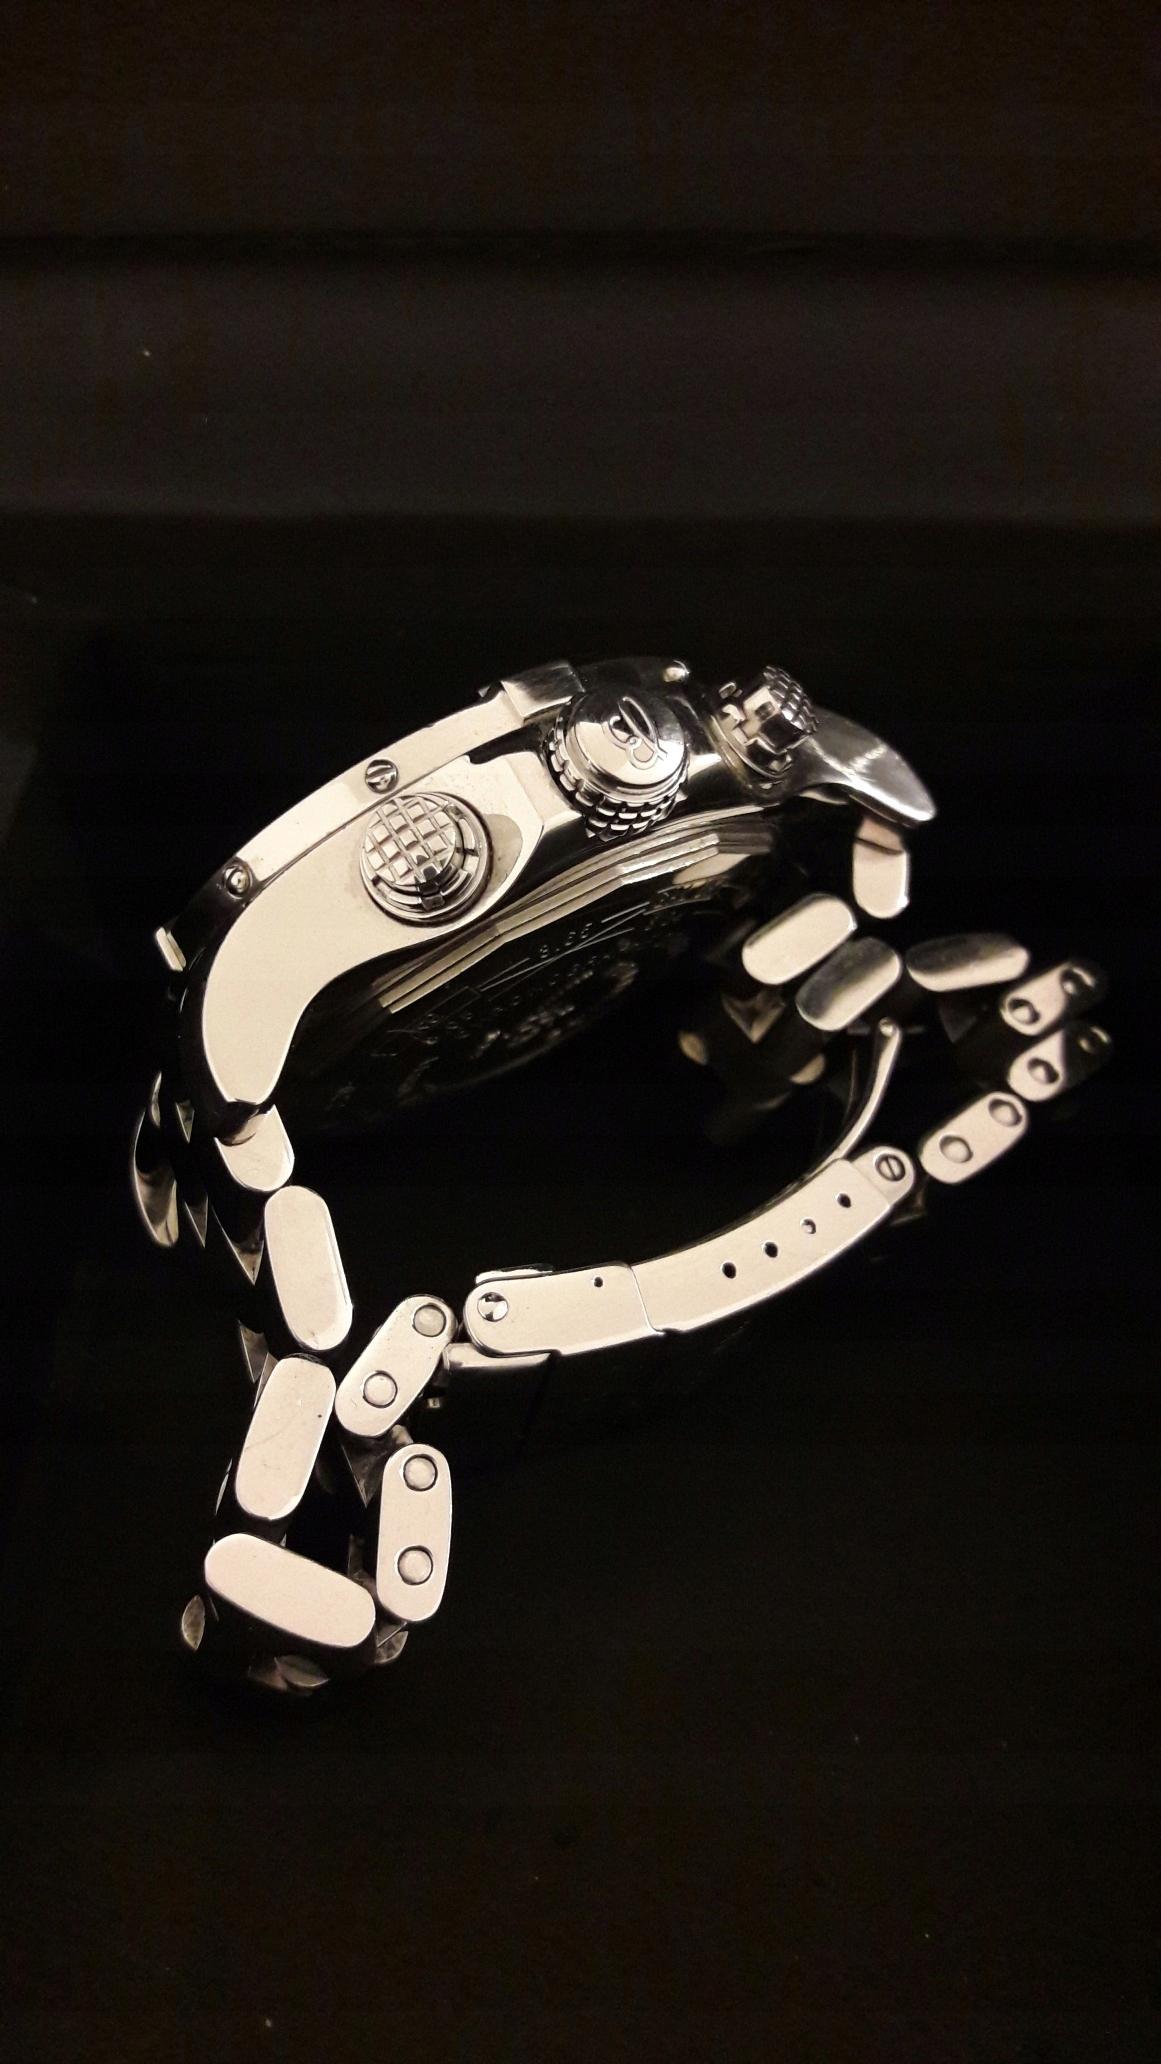 Breitling Super Avenger A13370 komplet okazja